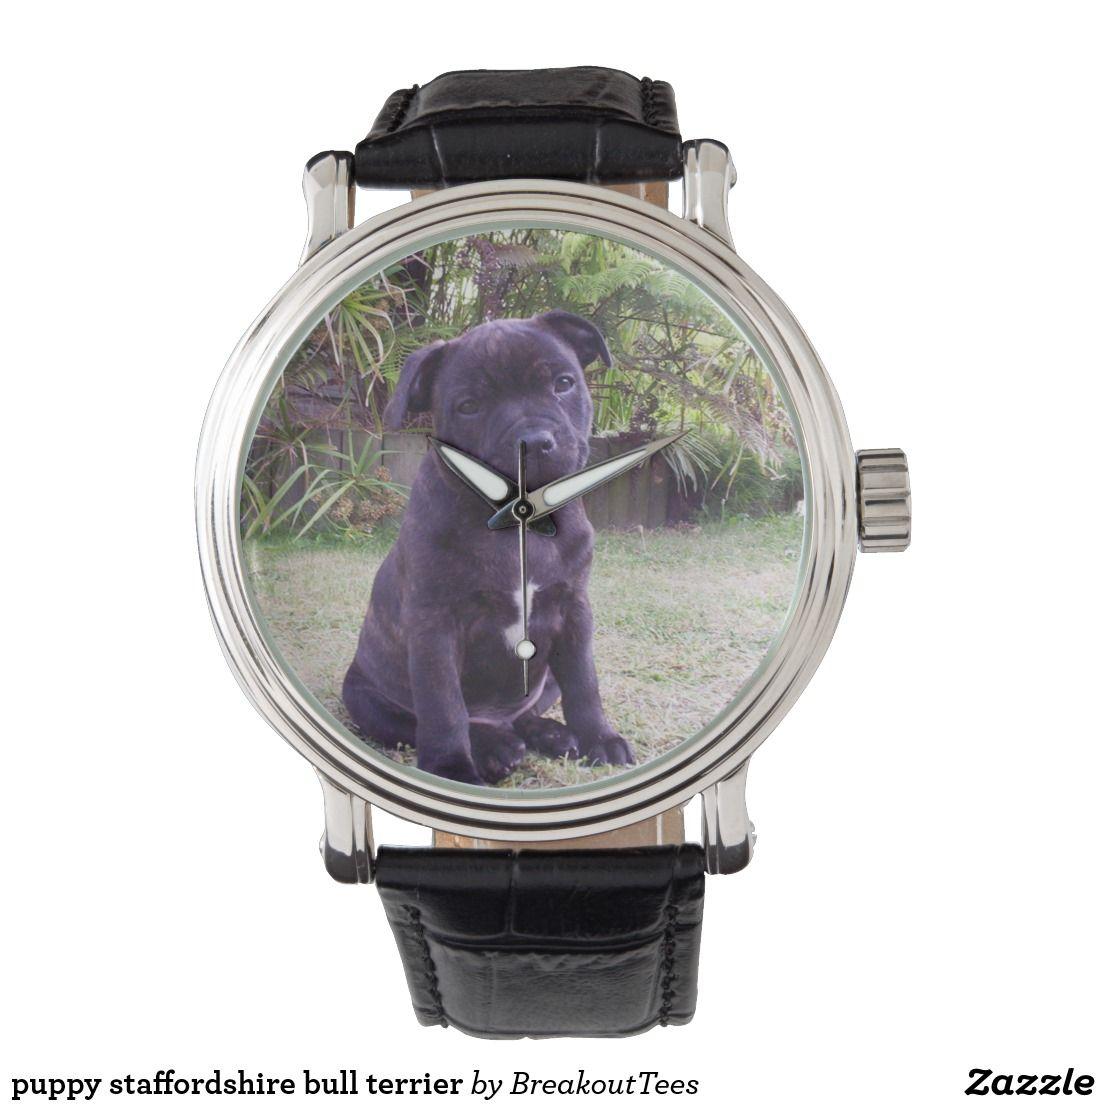 Puppy Staffordshire Bull Terrier Watch Zazzle Com Staffordshire Bull Terrier Bull Terrier Terrier